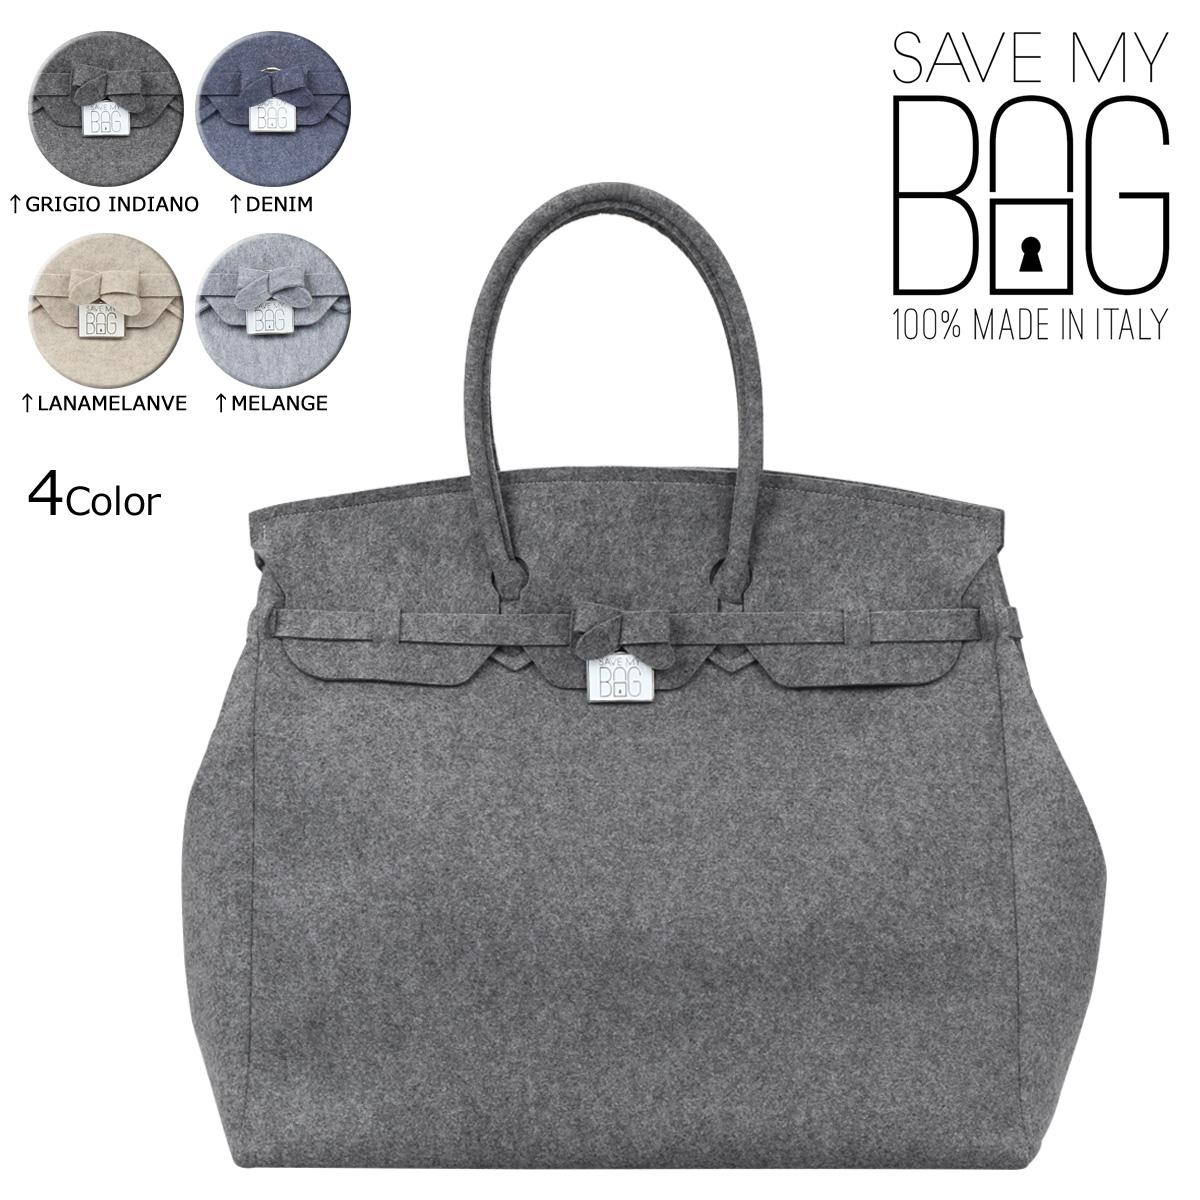 Allsports Save My Bag May Handbag Tote Weekender Felt Italy Made Xl Size Las Excluded Rakuten Global Market